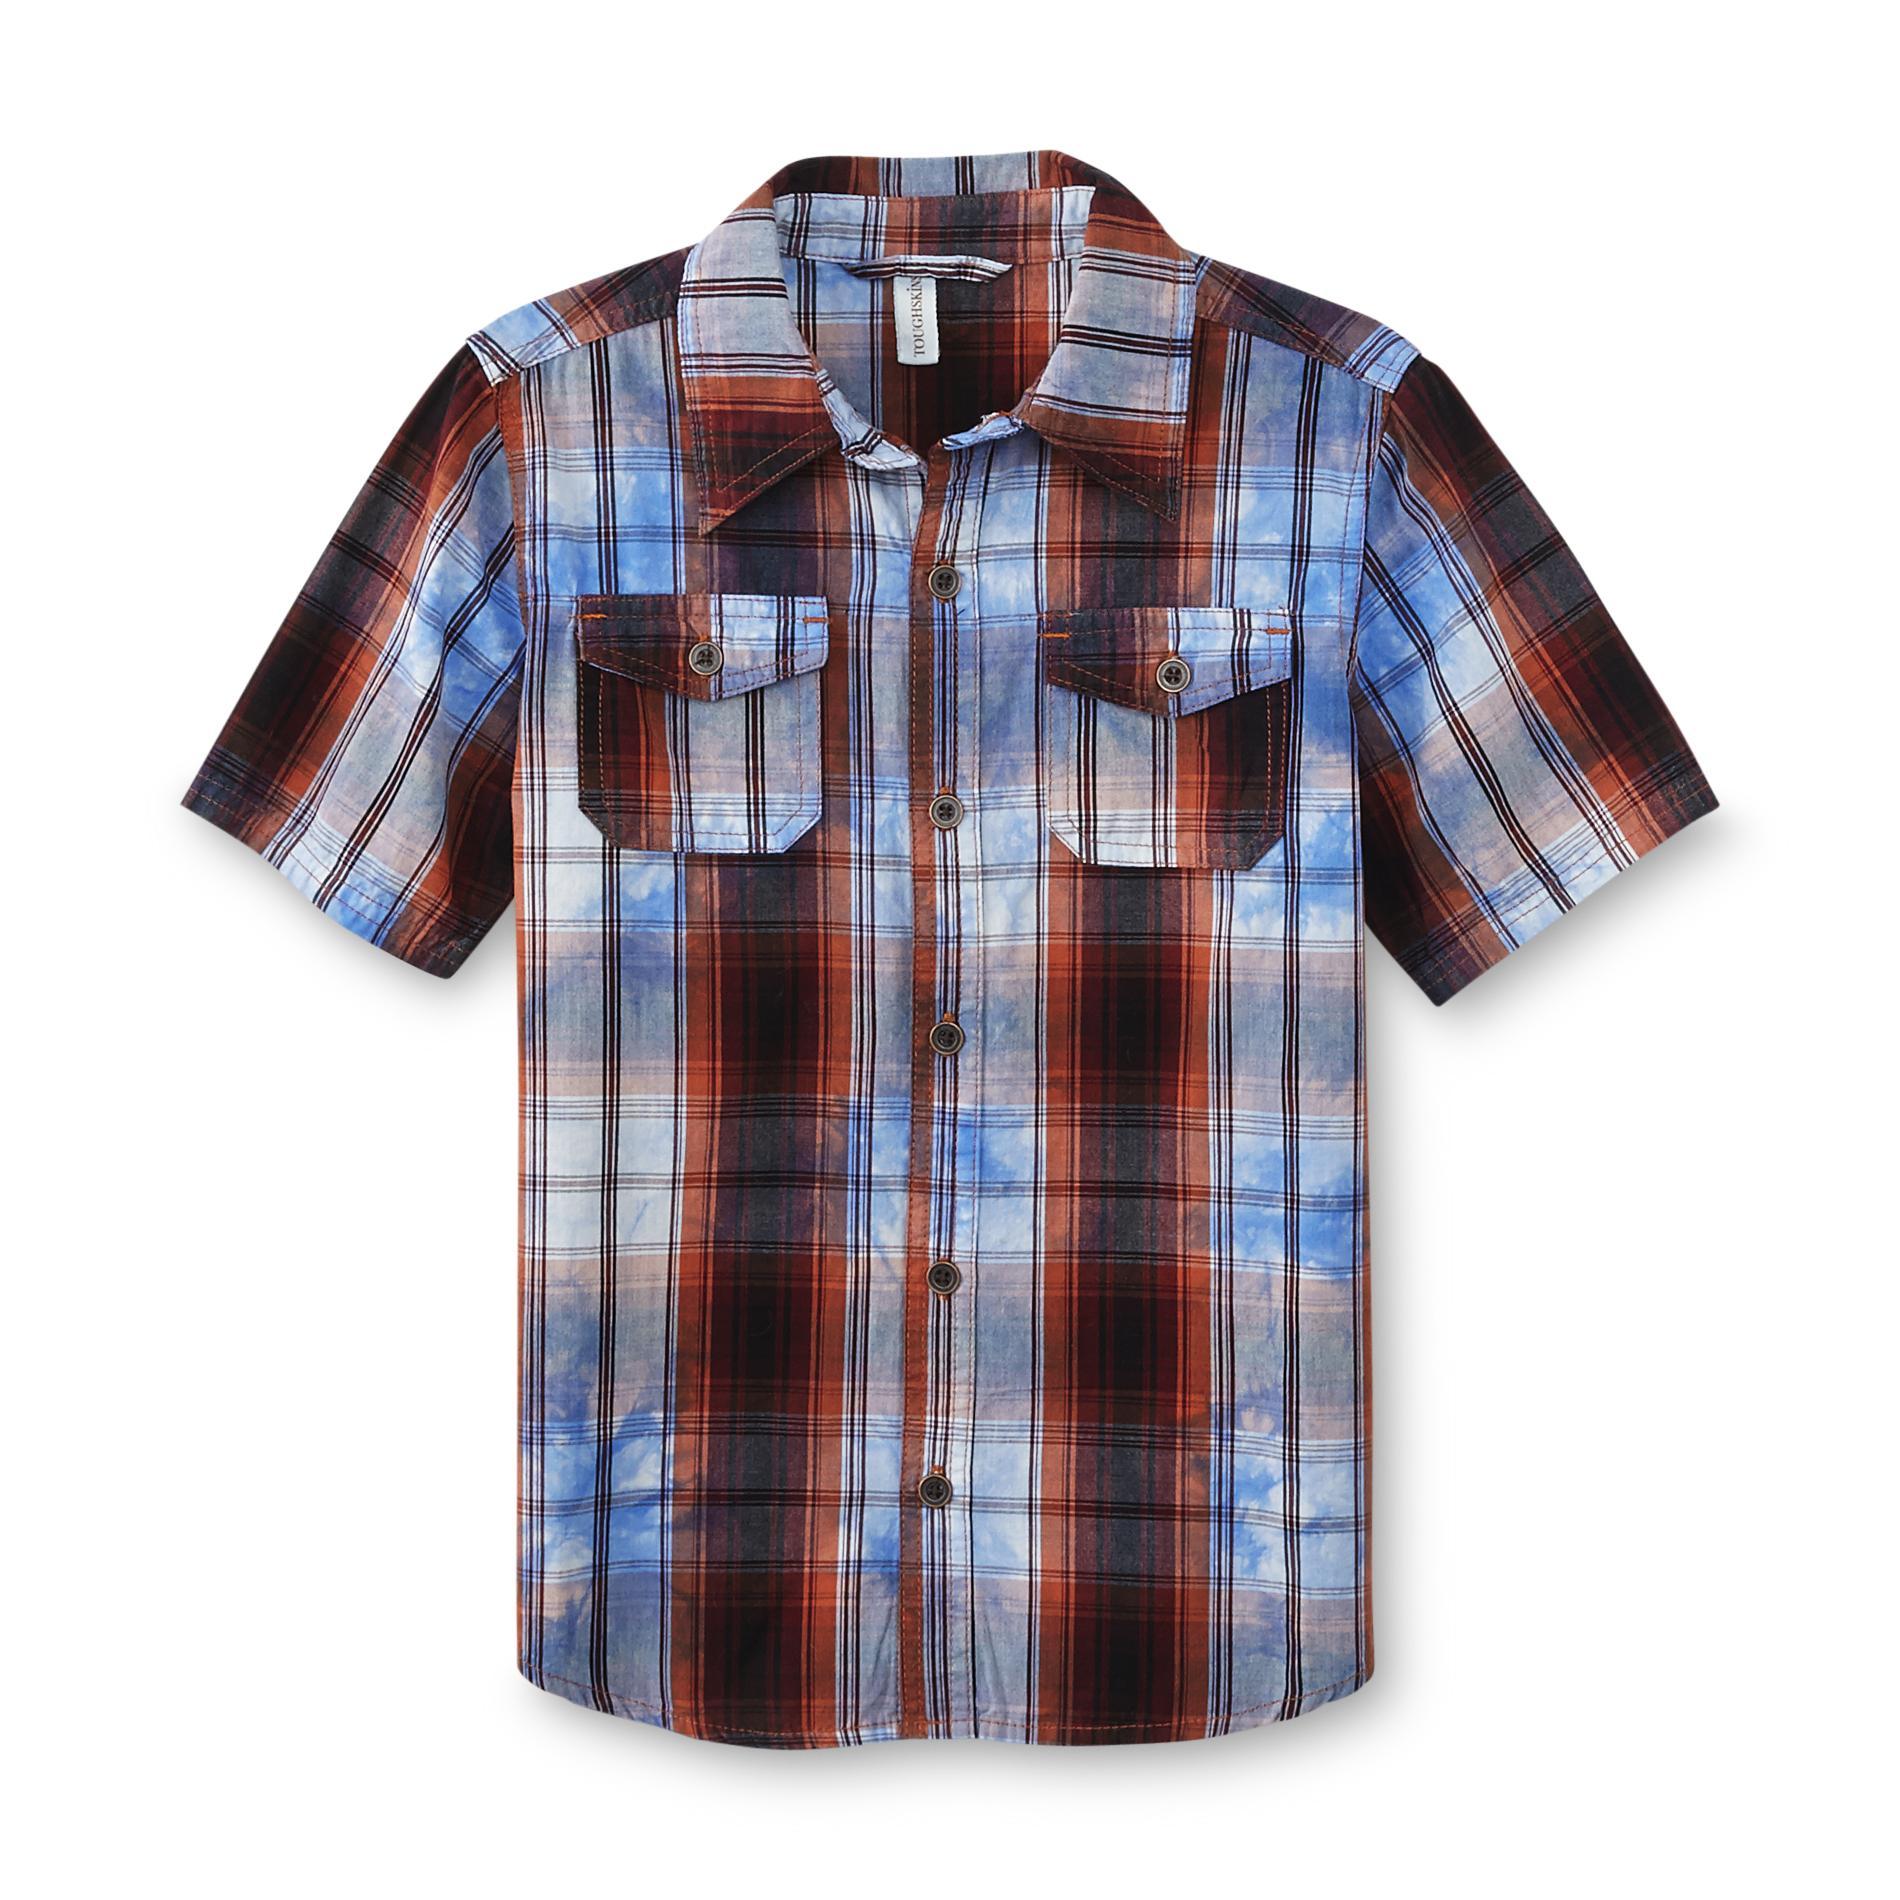 Toughskins Boy's Button-Front Shirt - Plaid